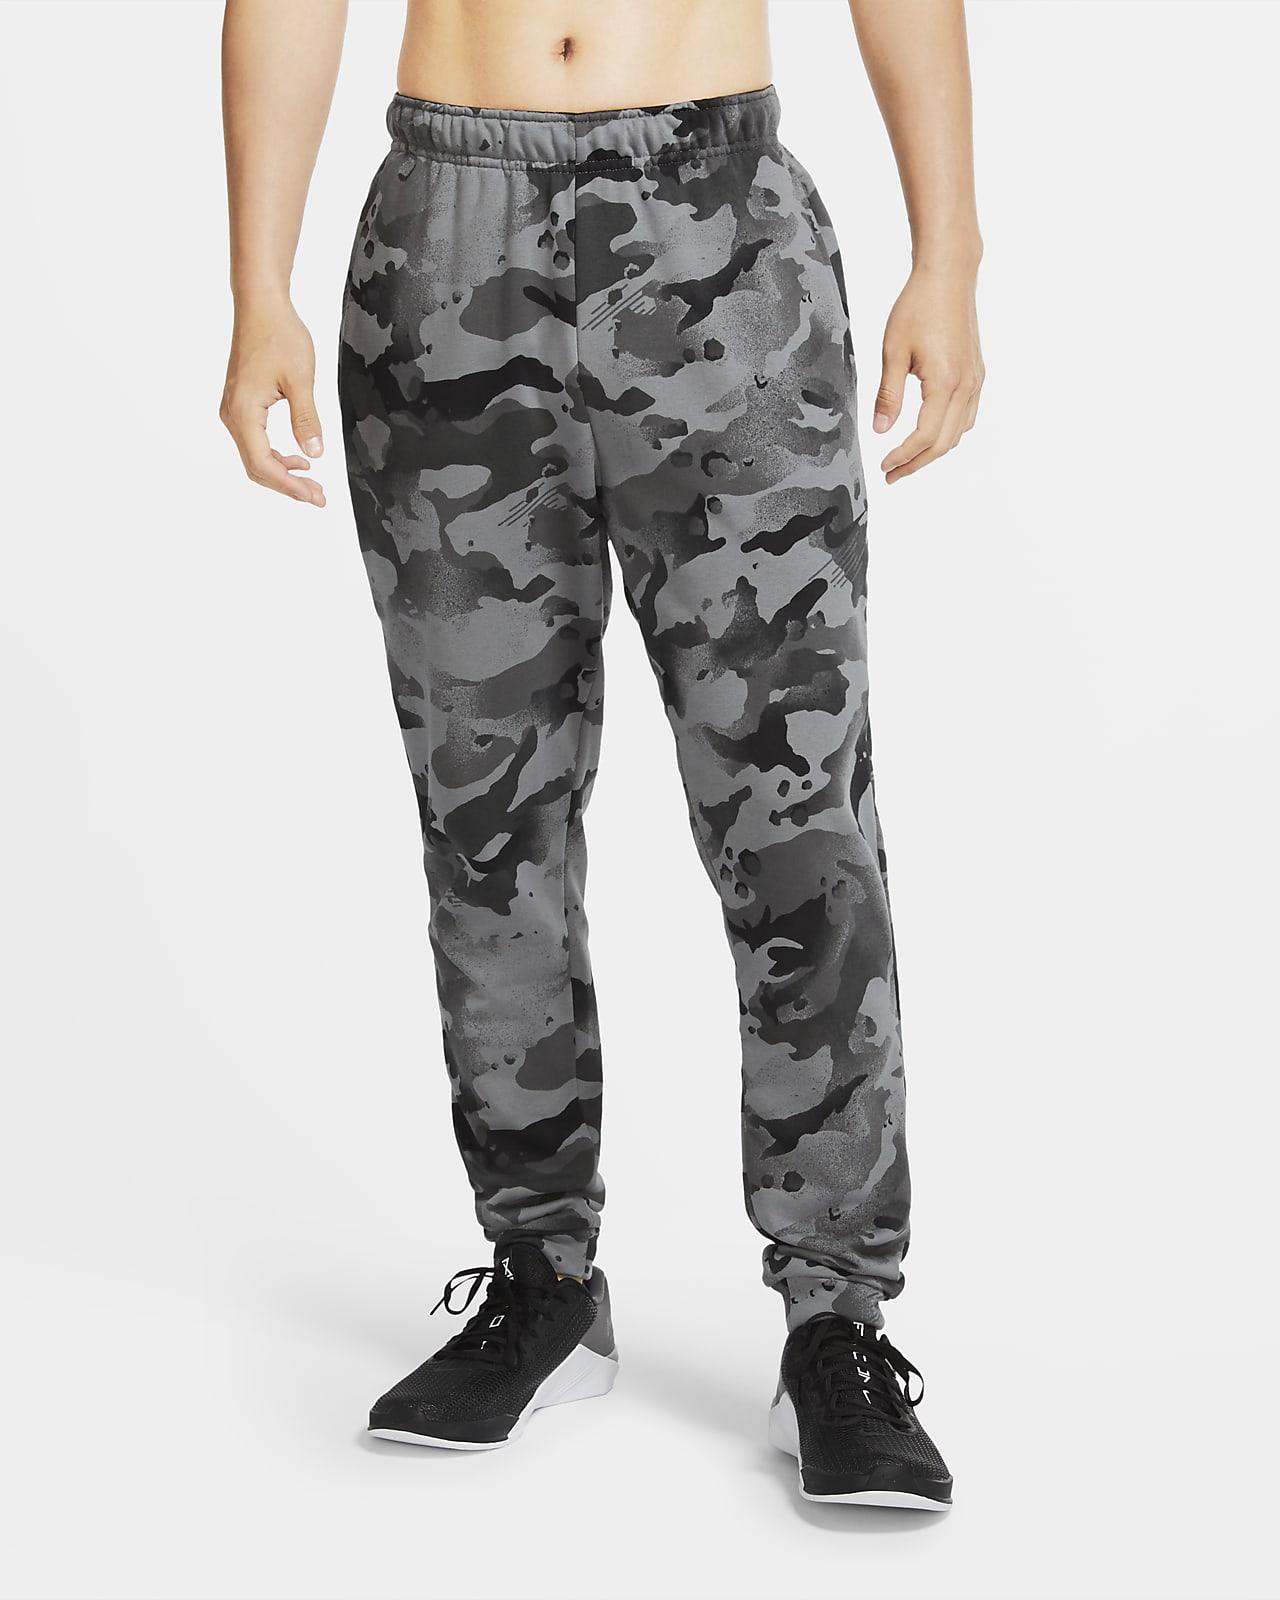 Nike Dri-FIT Men's Camo Training Trousers